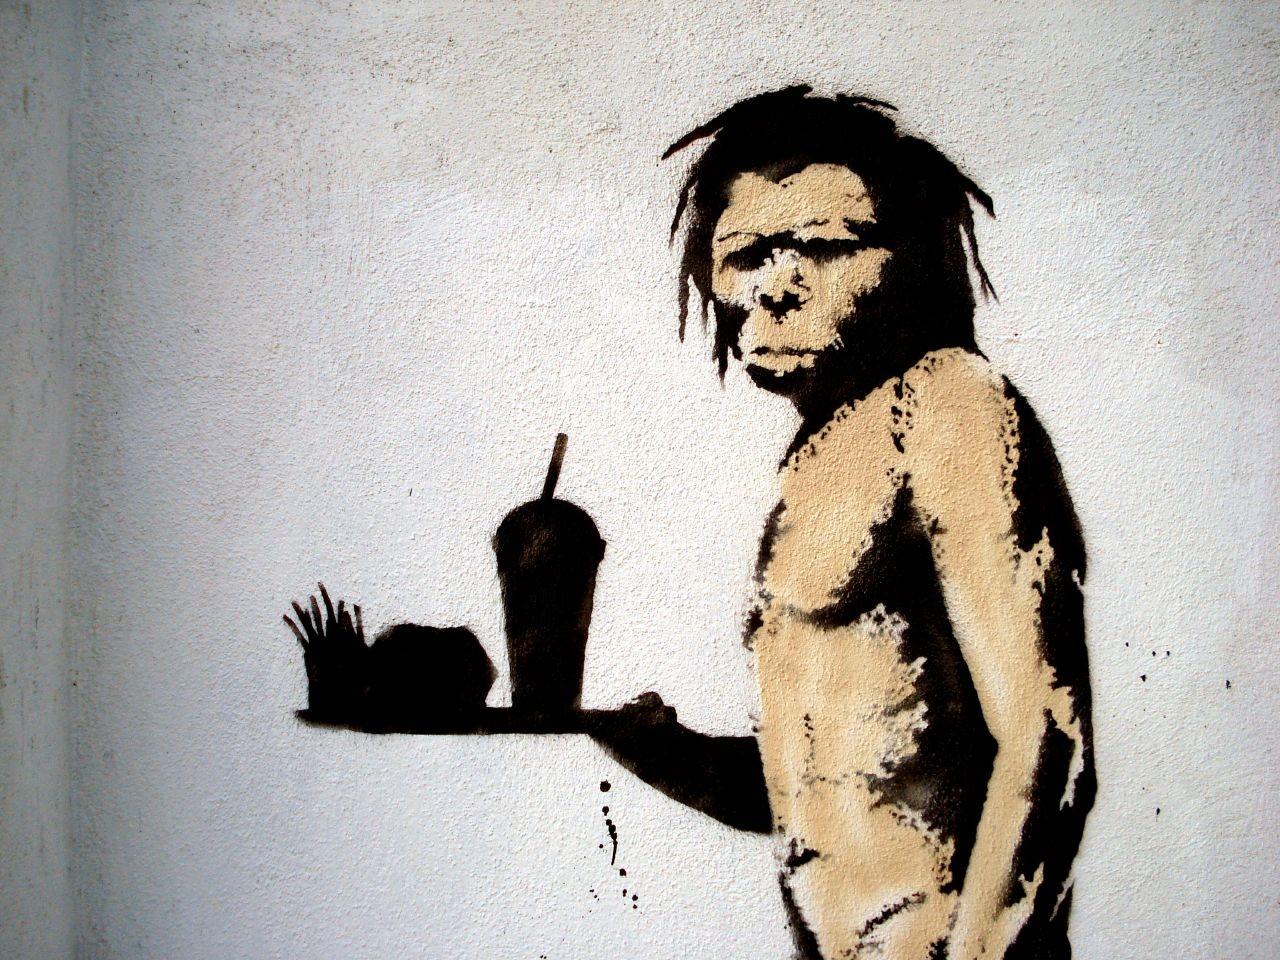 obra de banksy (Foto: Lord Jim / flickr / creative commons)